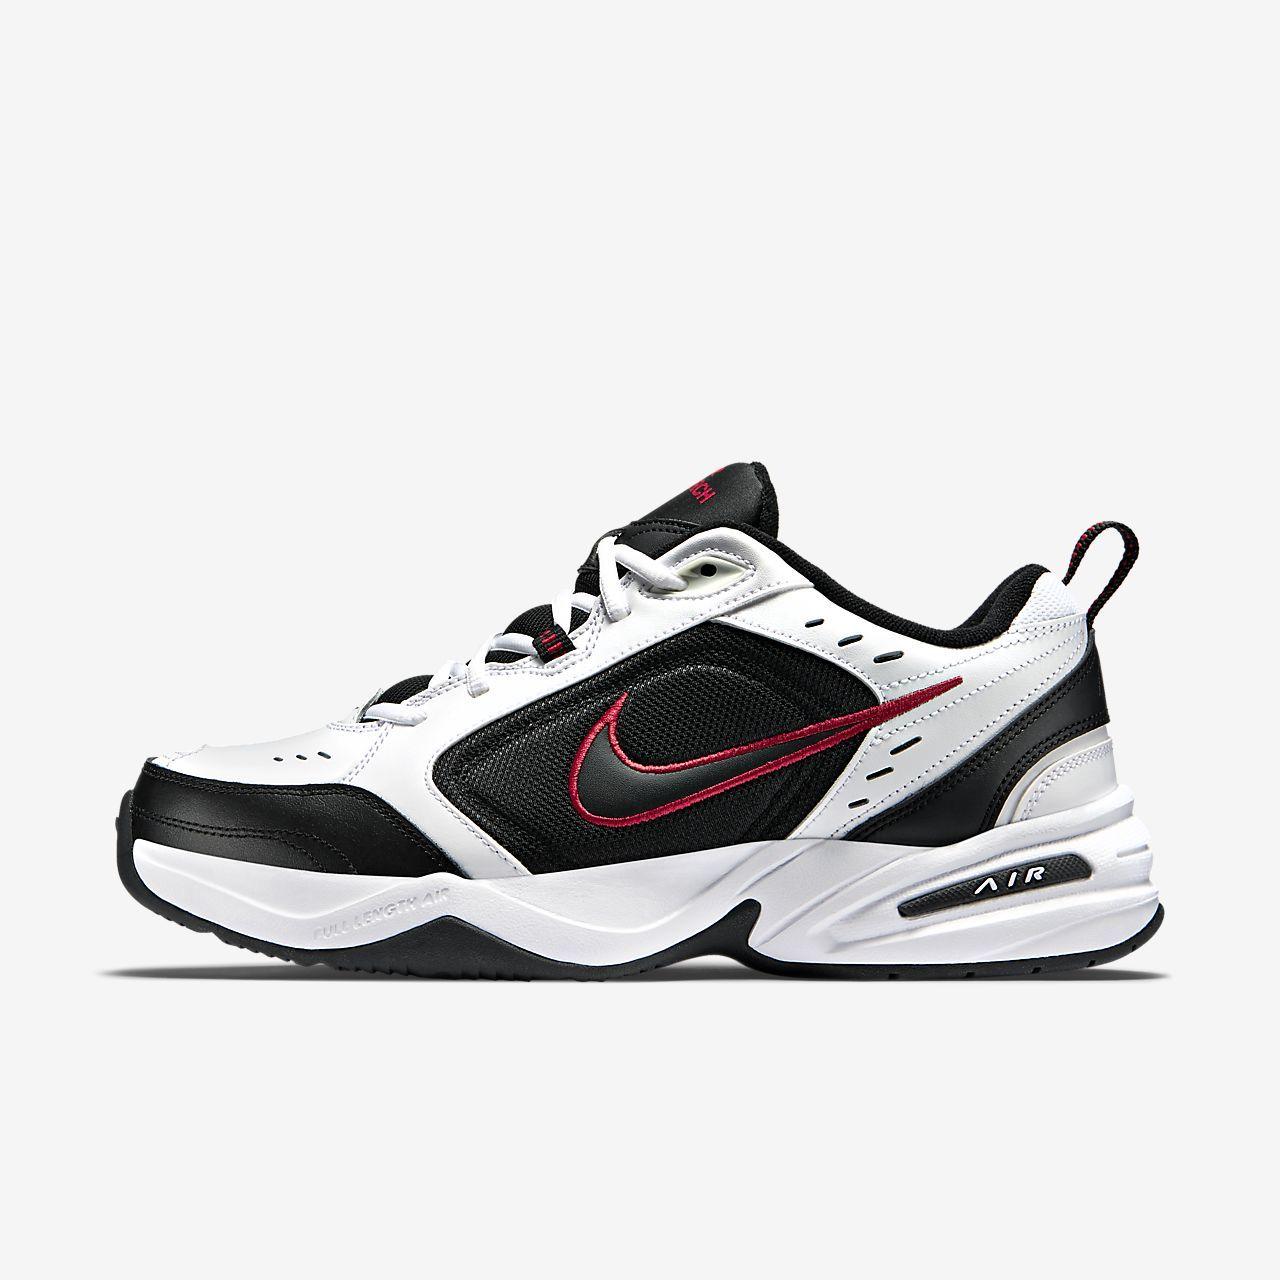 new arrival ca60f 31272 Nike Air Monarch IV Unisex Training Shoe